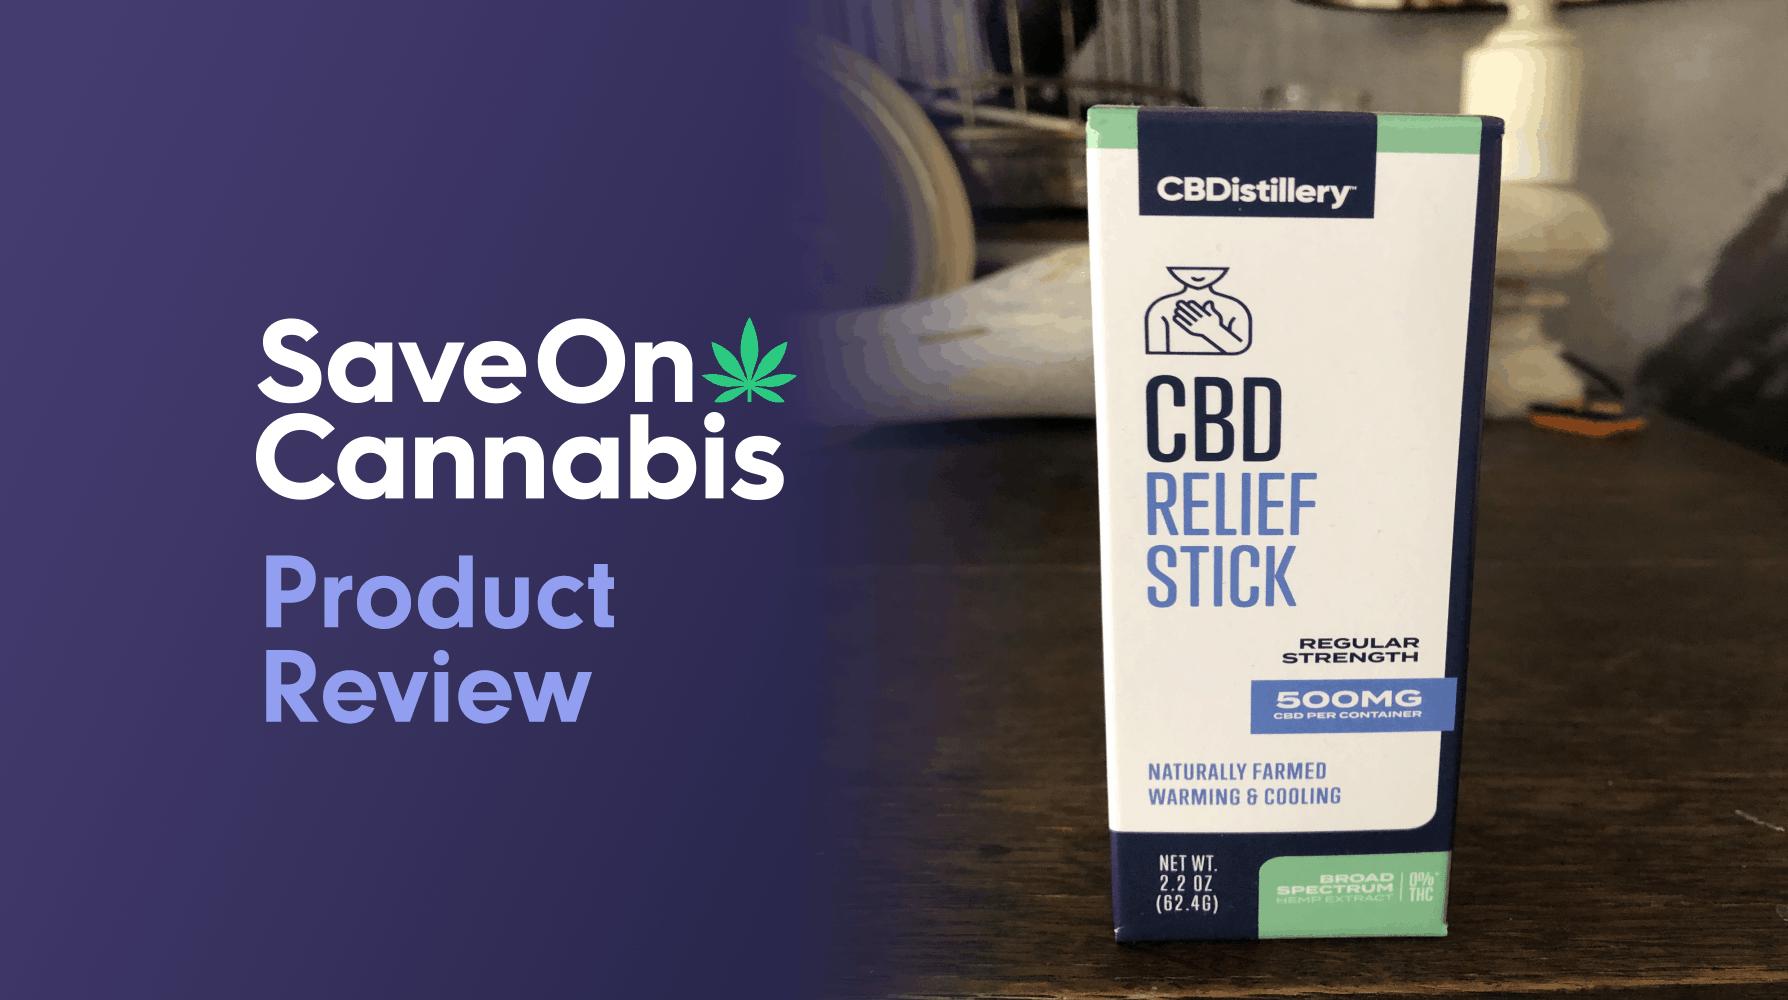 Cbdistillery CBD Relief Stick Save On Cannabis Review Website